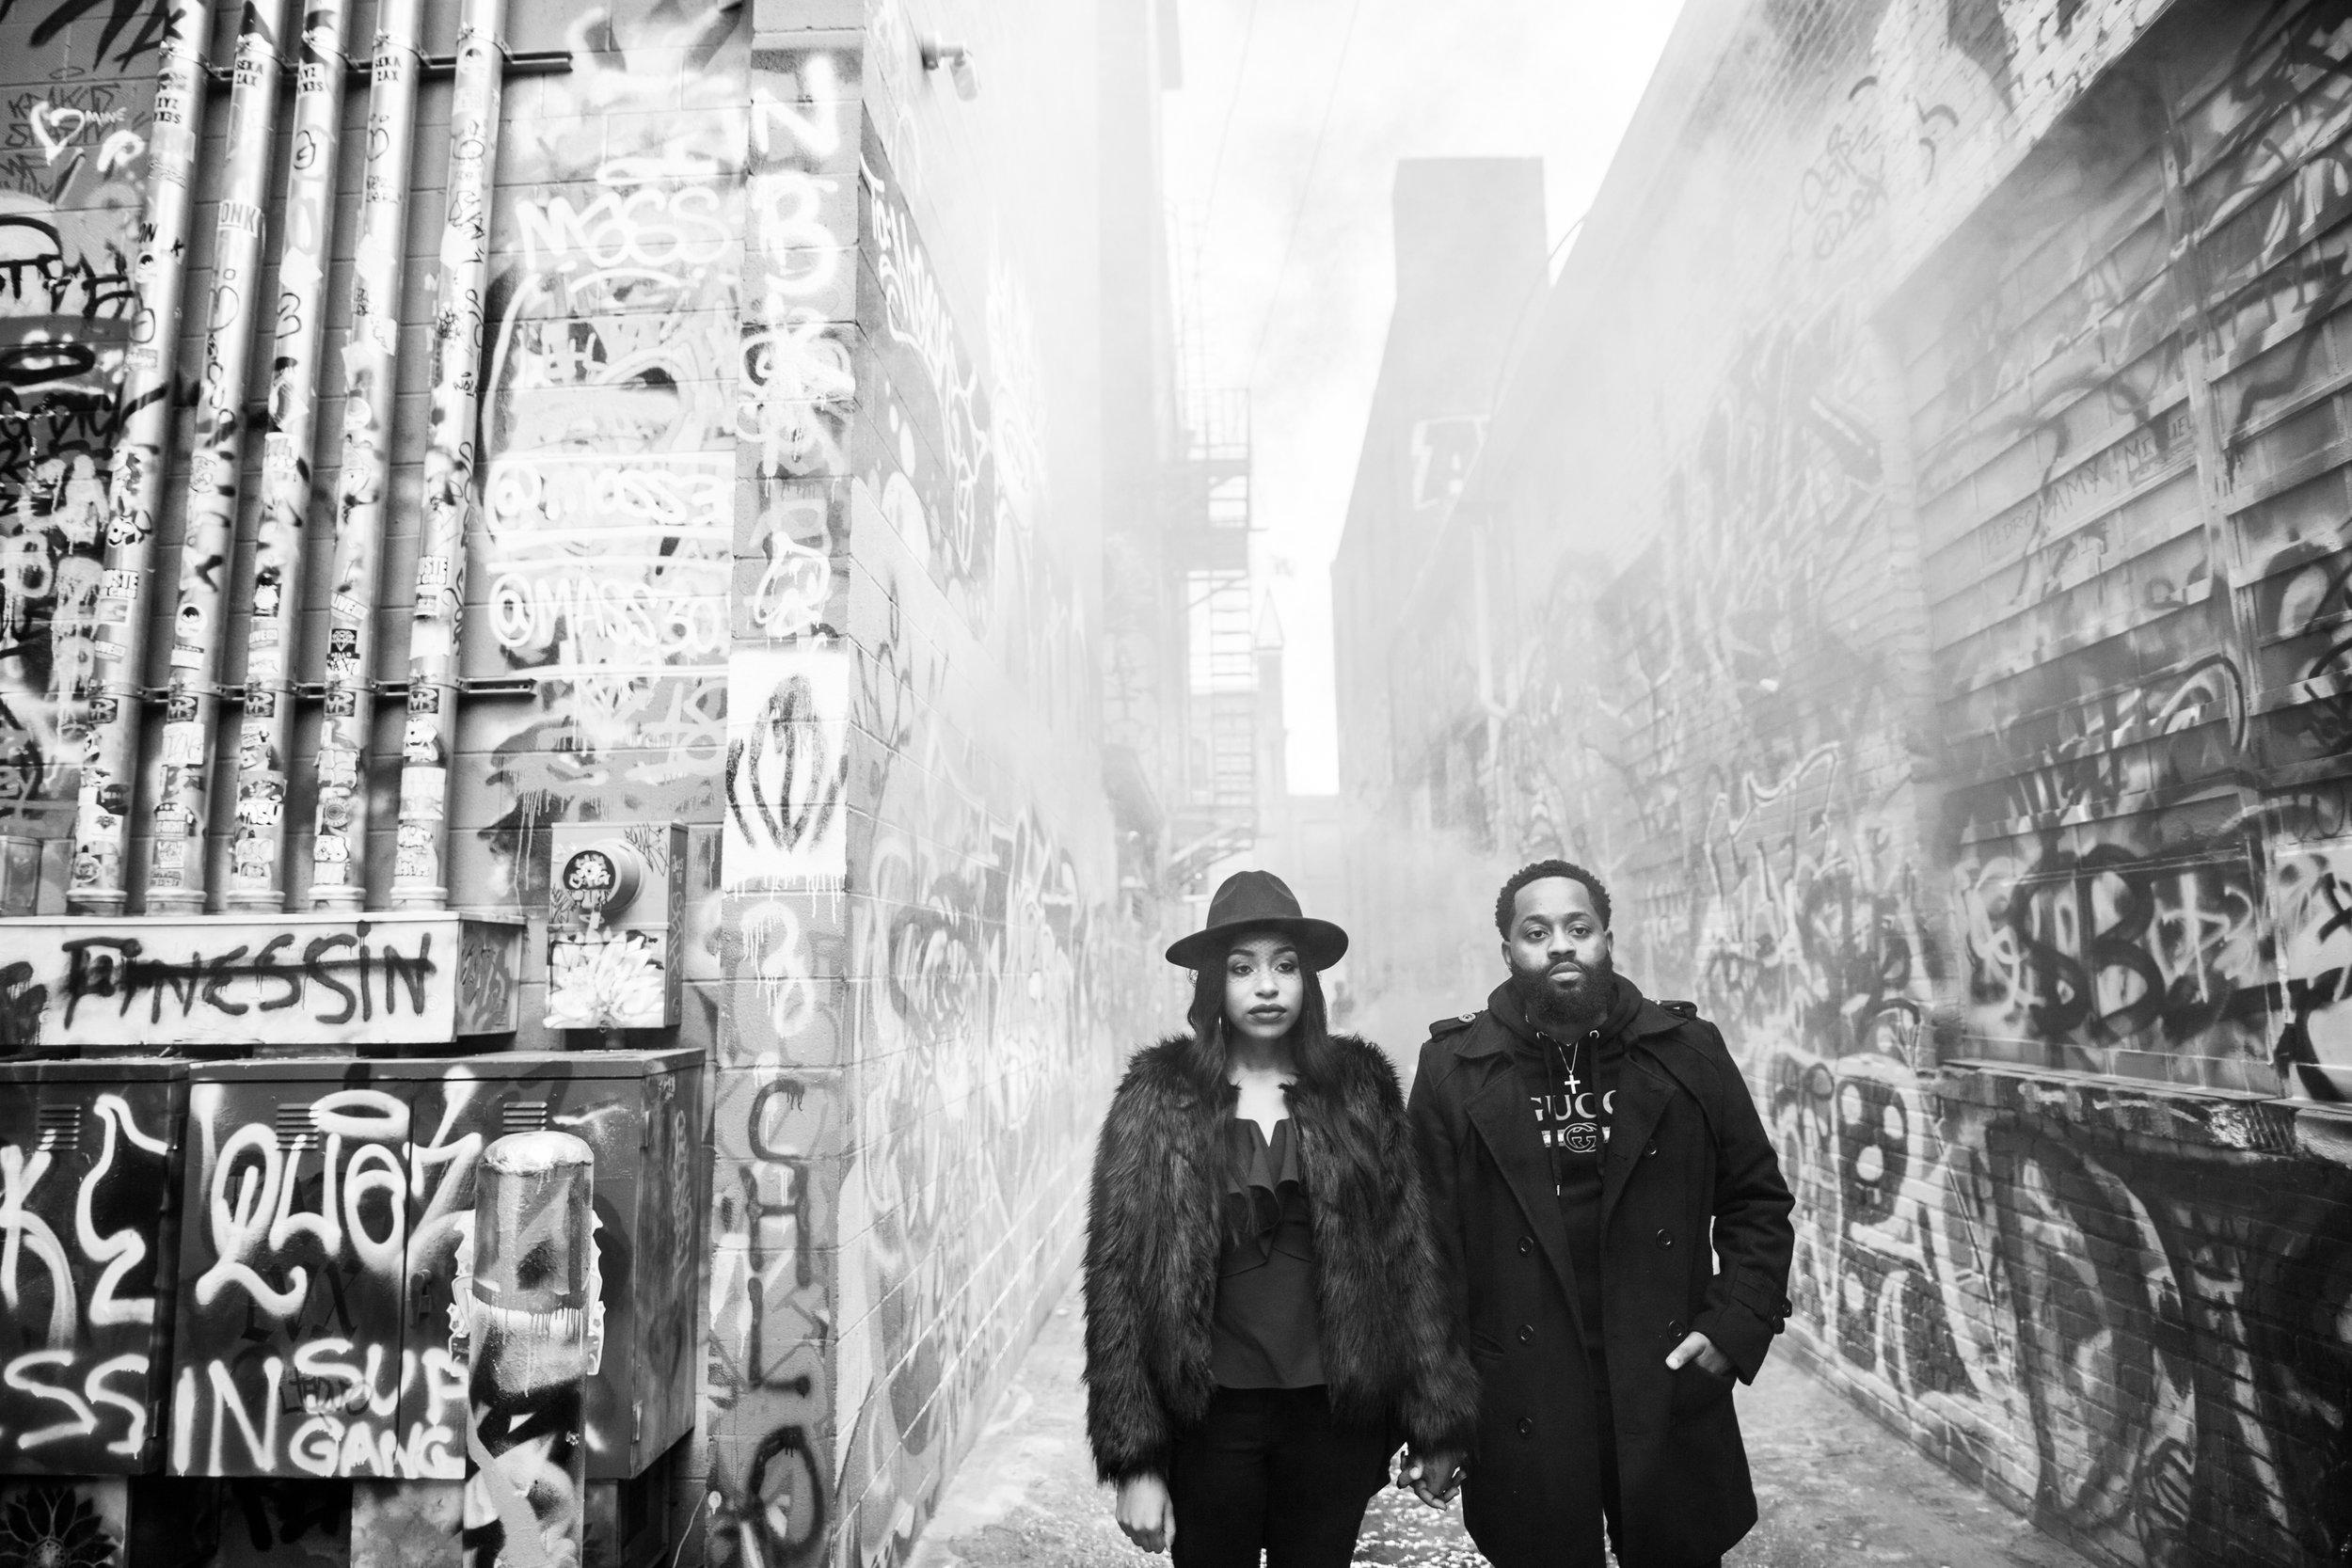 Creative Baltimore Graffiti Alley Engagement Session Megapixels Media Photography-50.jpg